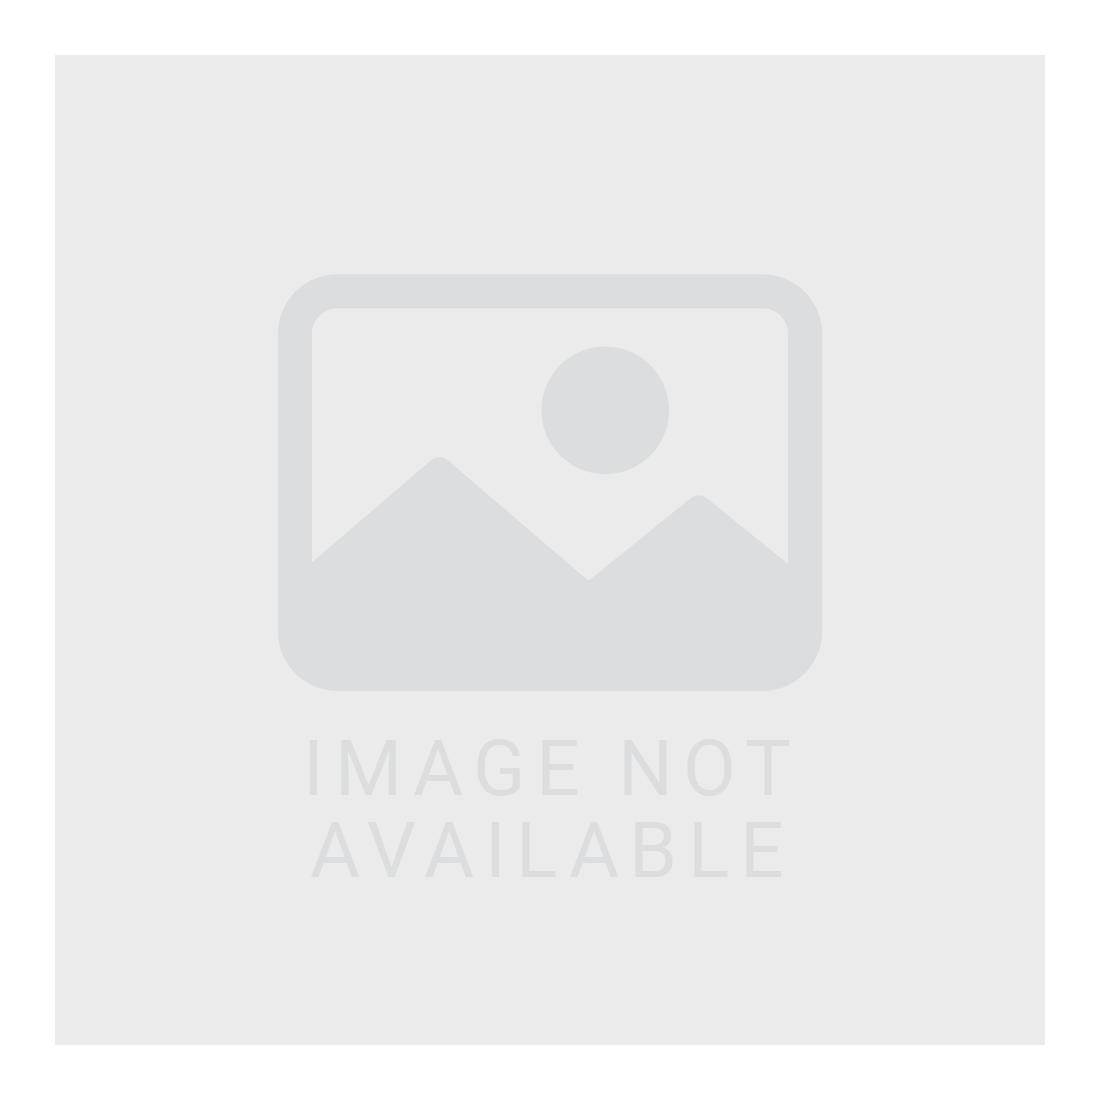 Women's Show Your Strength T-shirt